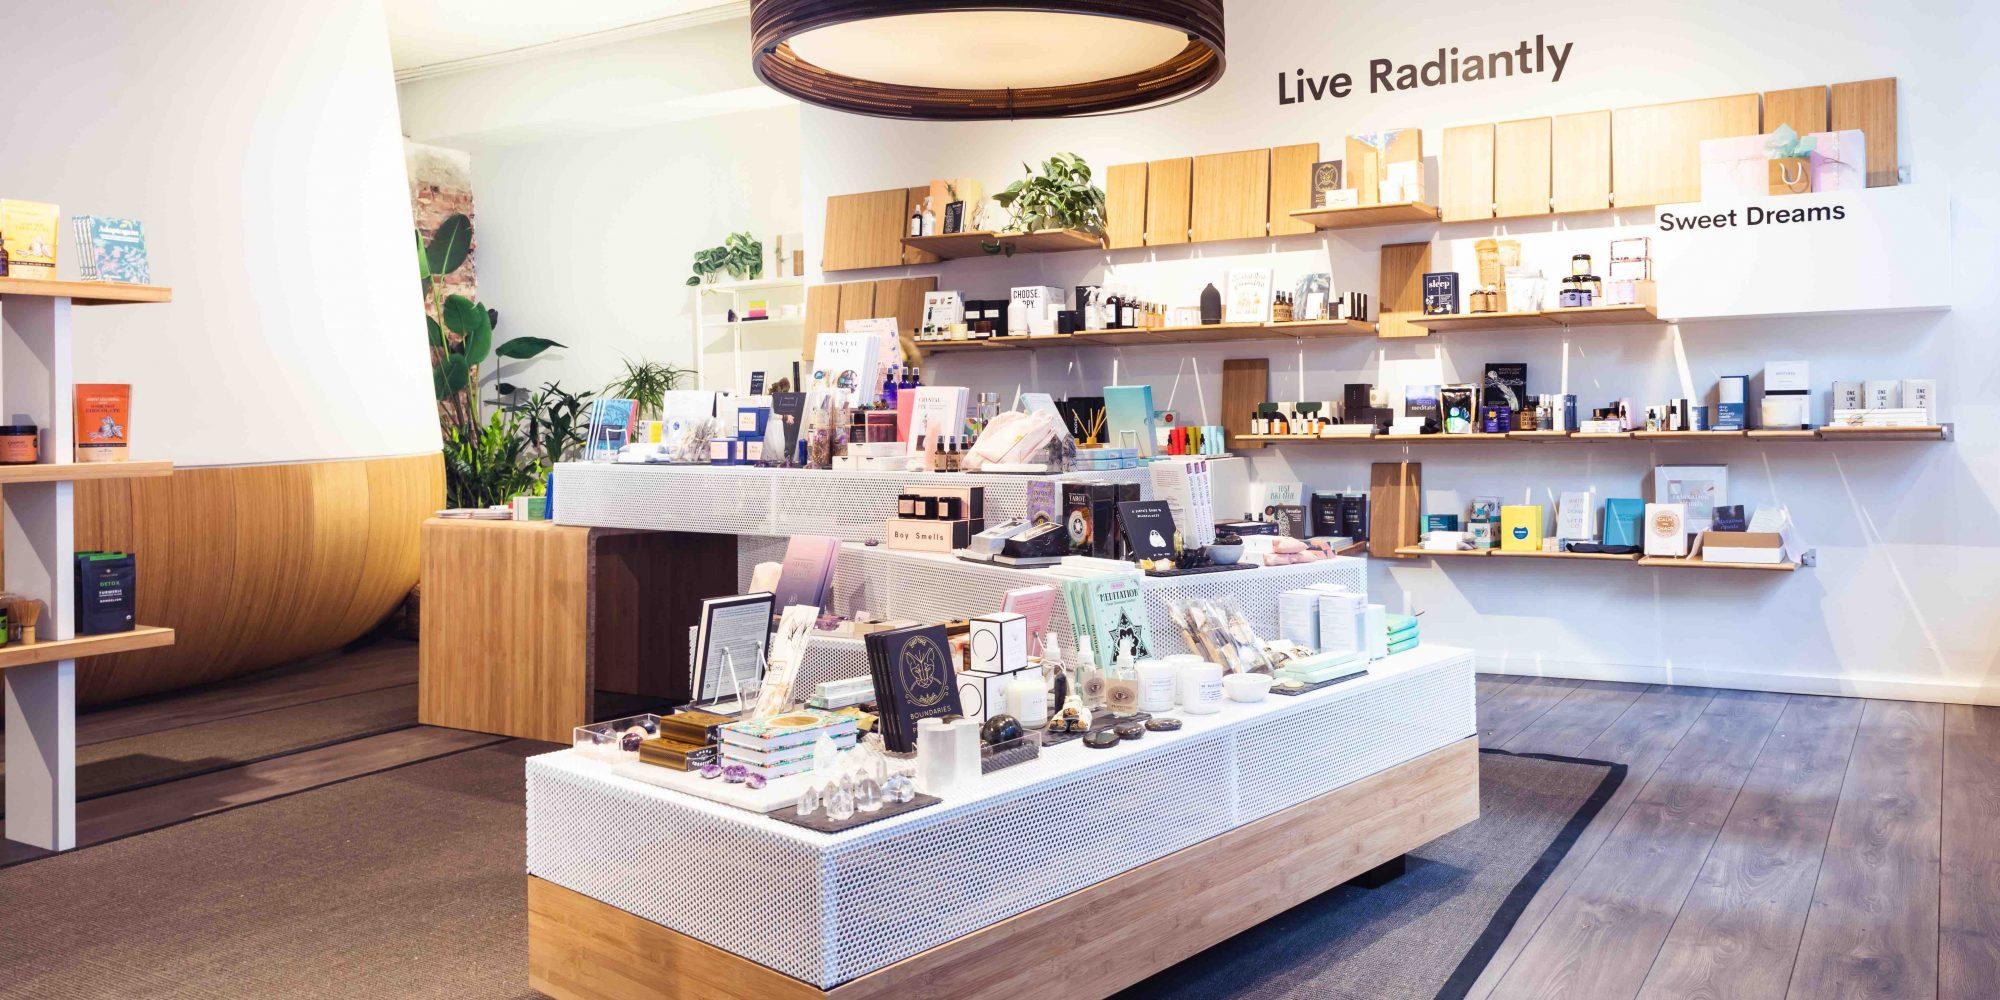 Inside Meditation Studio Inscape's Intention-Based Retail